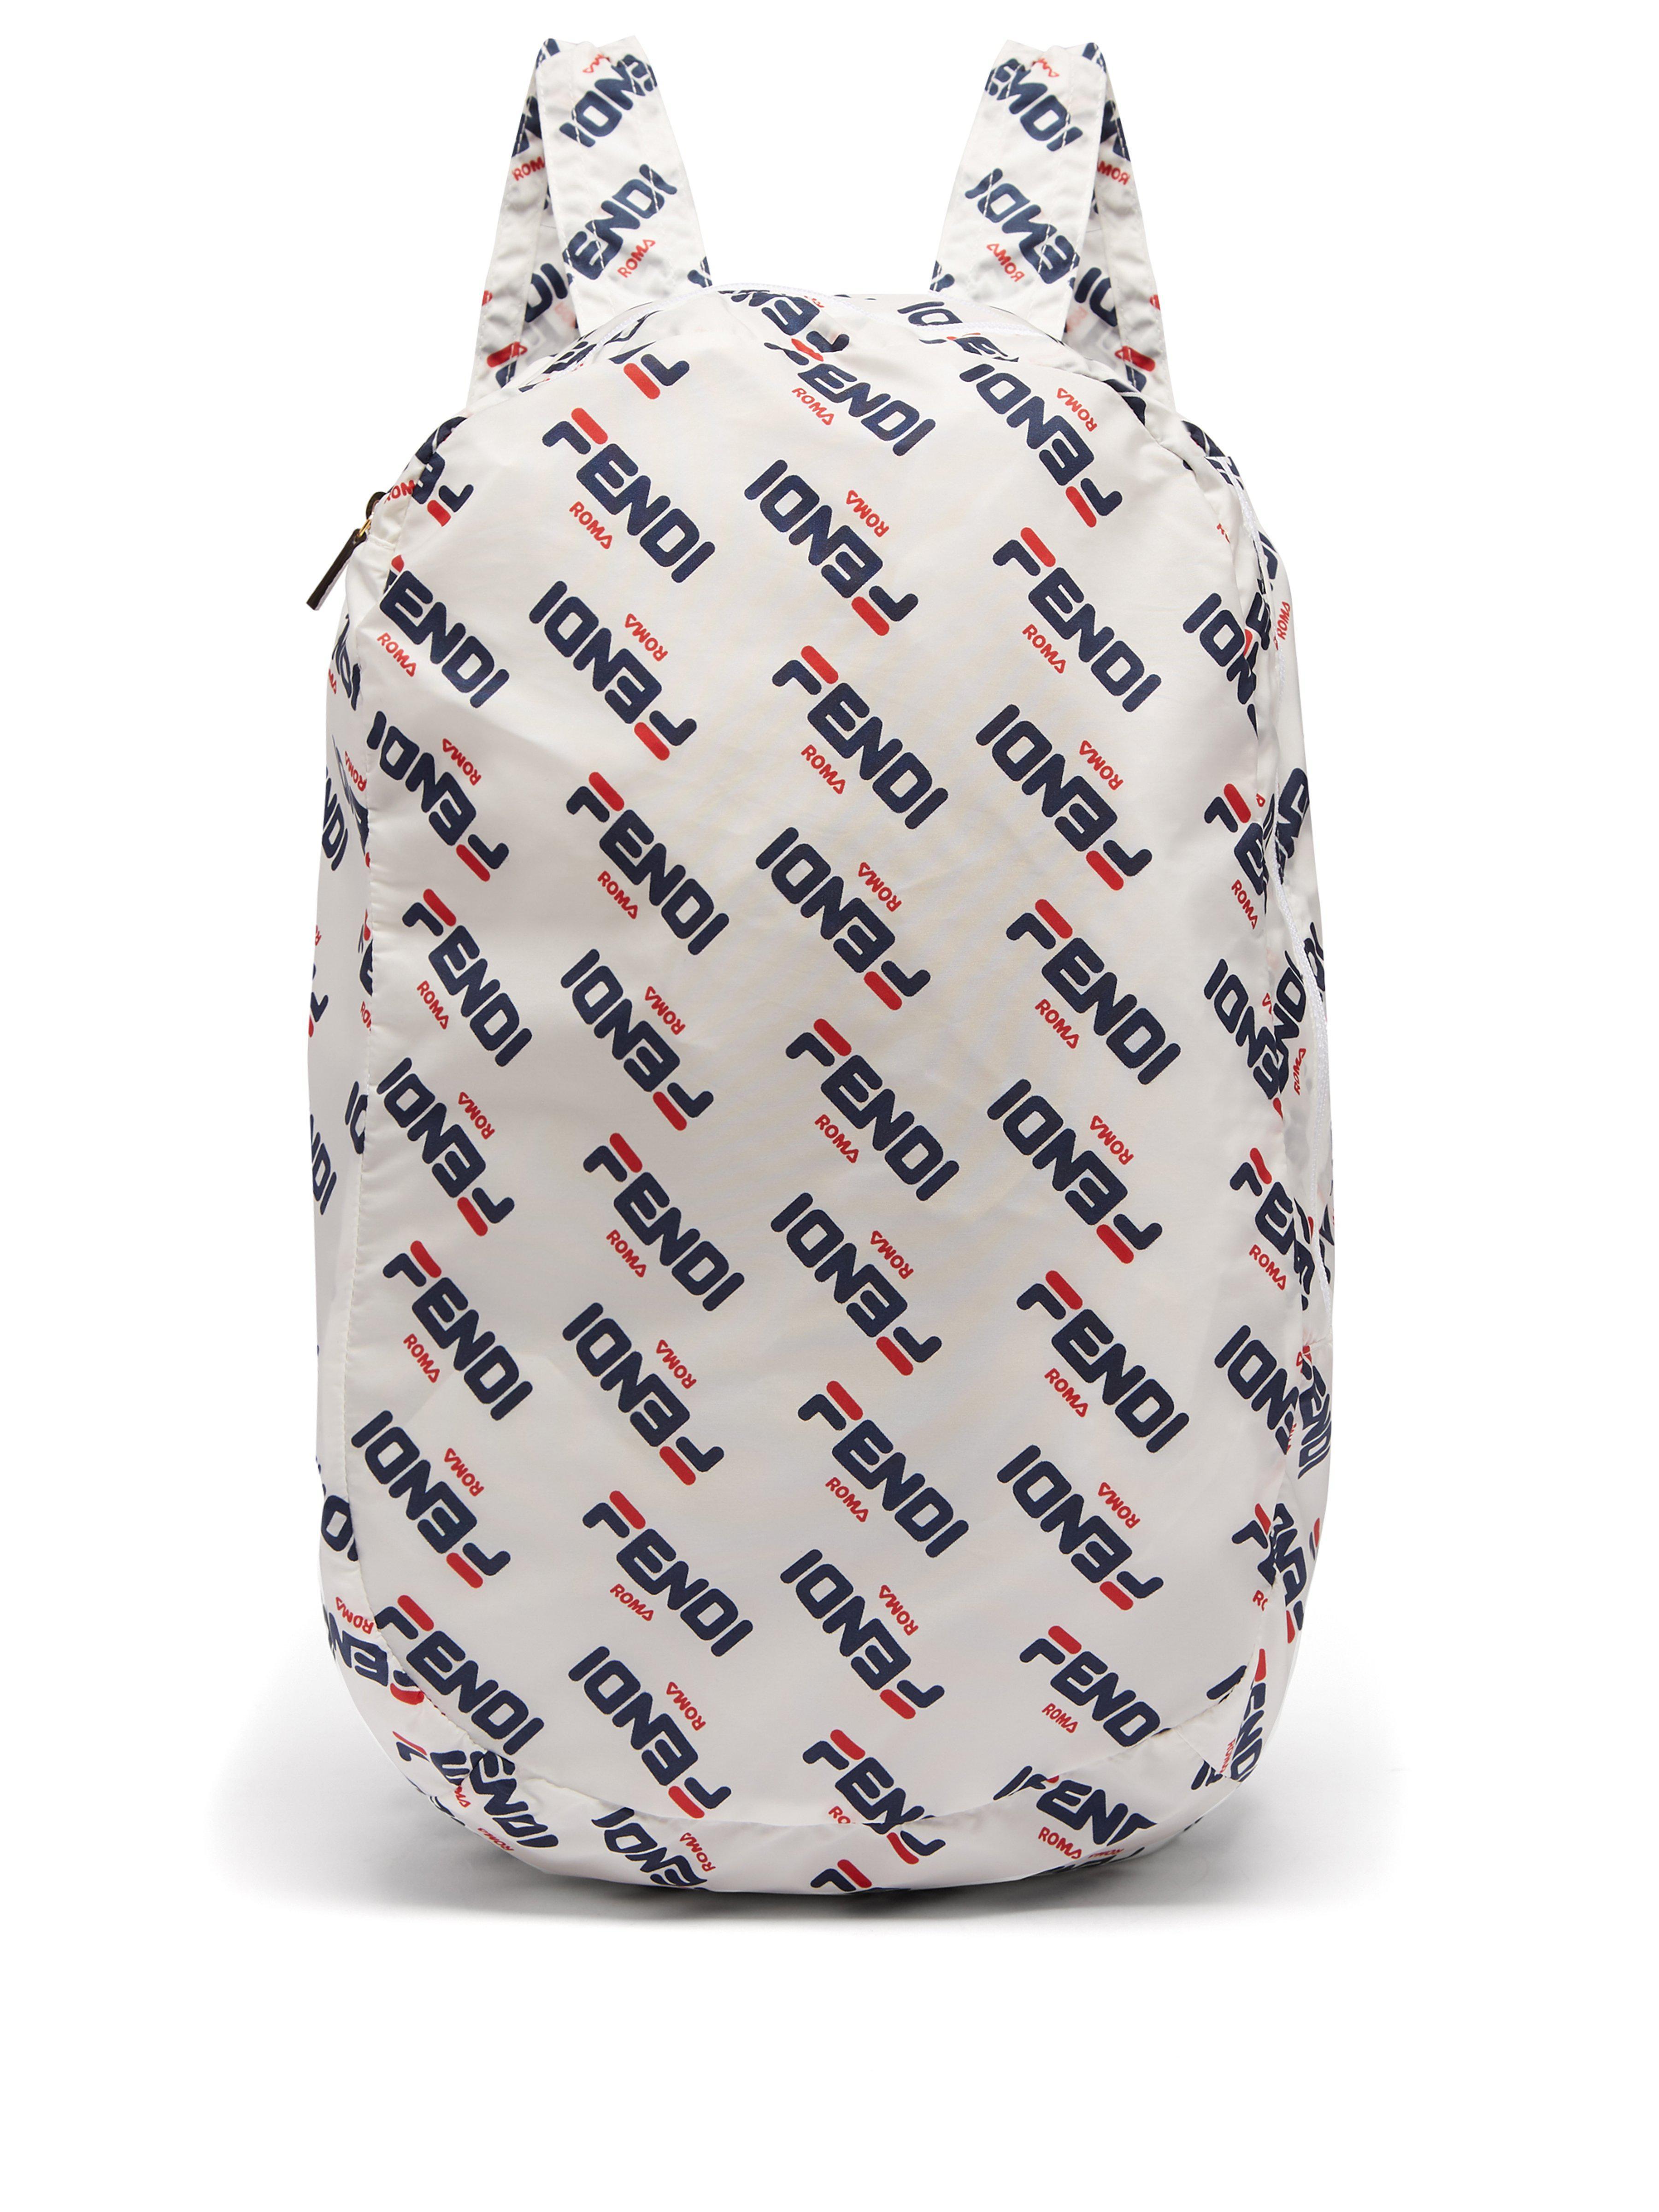 Fendi Mania Help Leather Bag Charm in White - Lyst 2fab98f1a5704